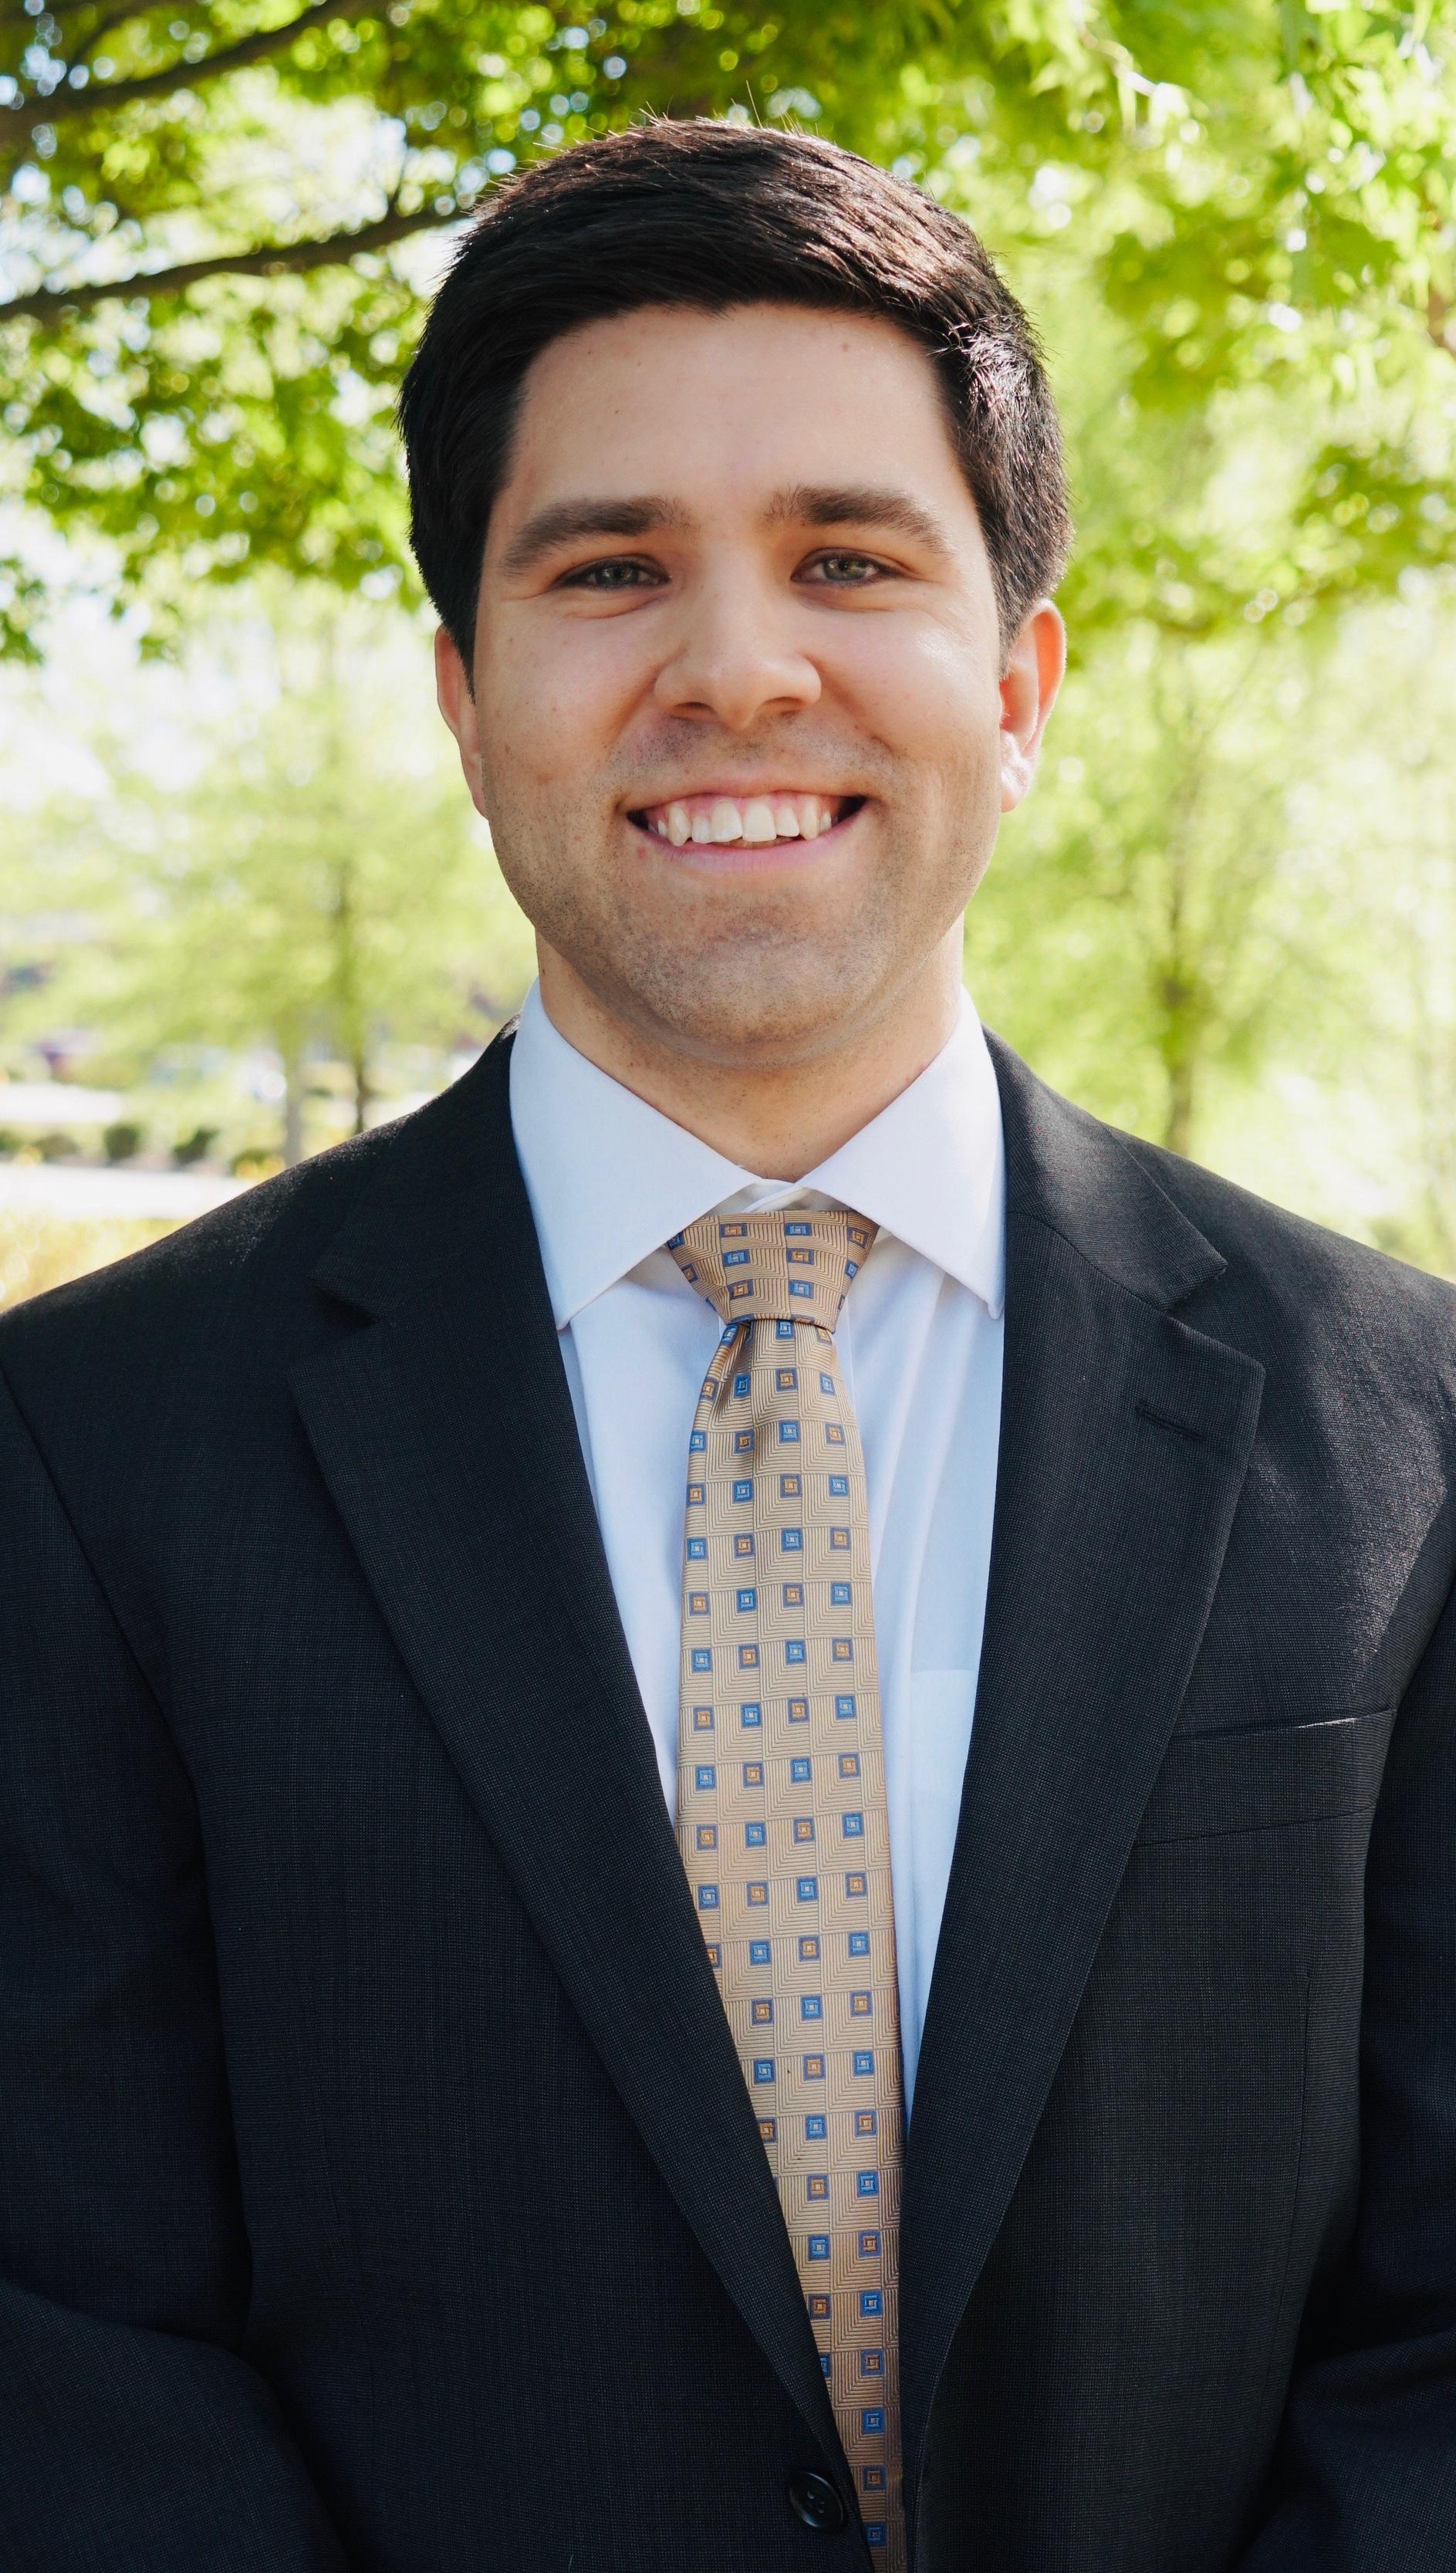 Sam Bogaczyk | Board Member   - Dedicated - Strategic - Compassionate